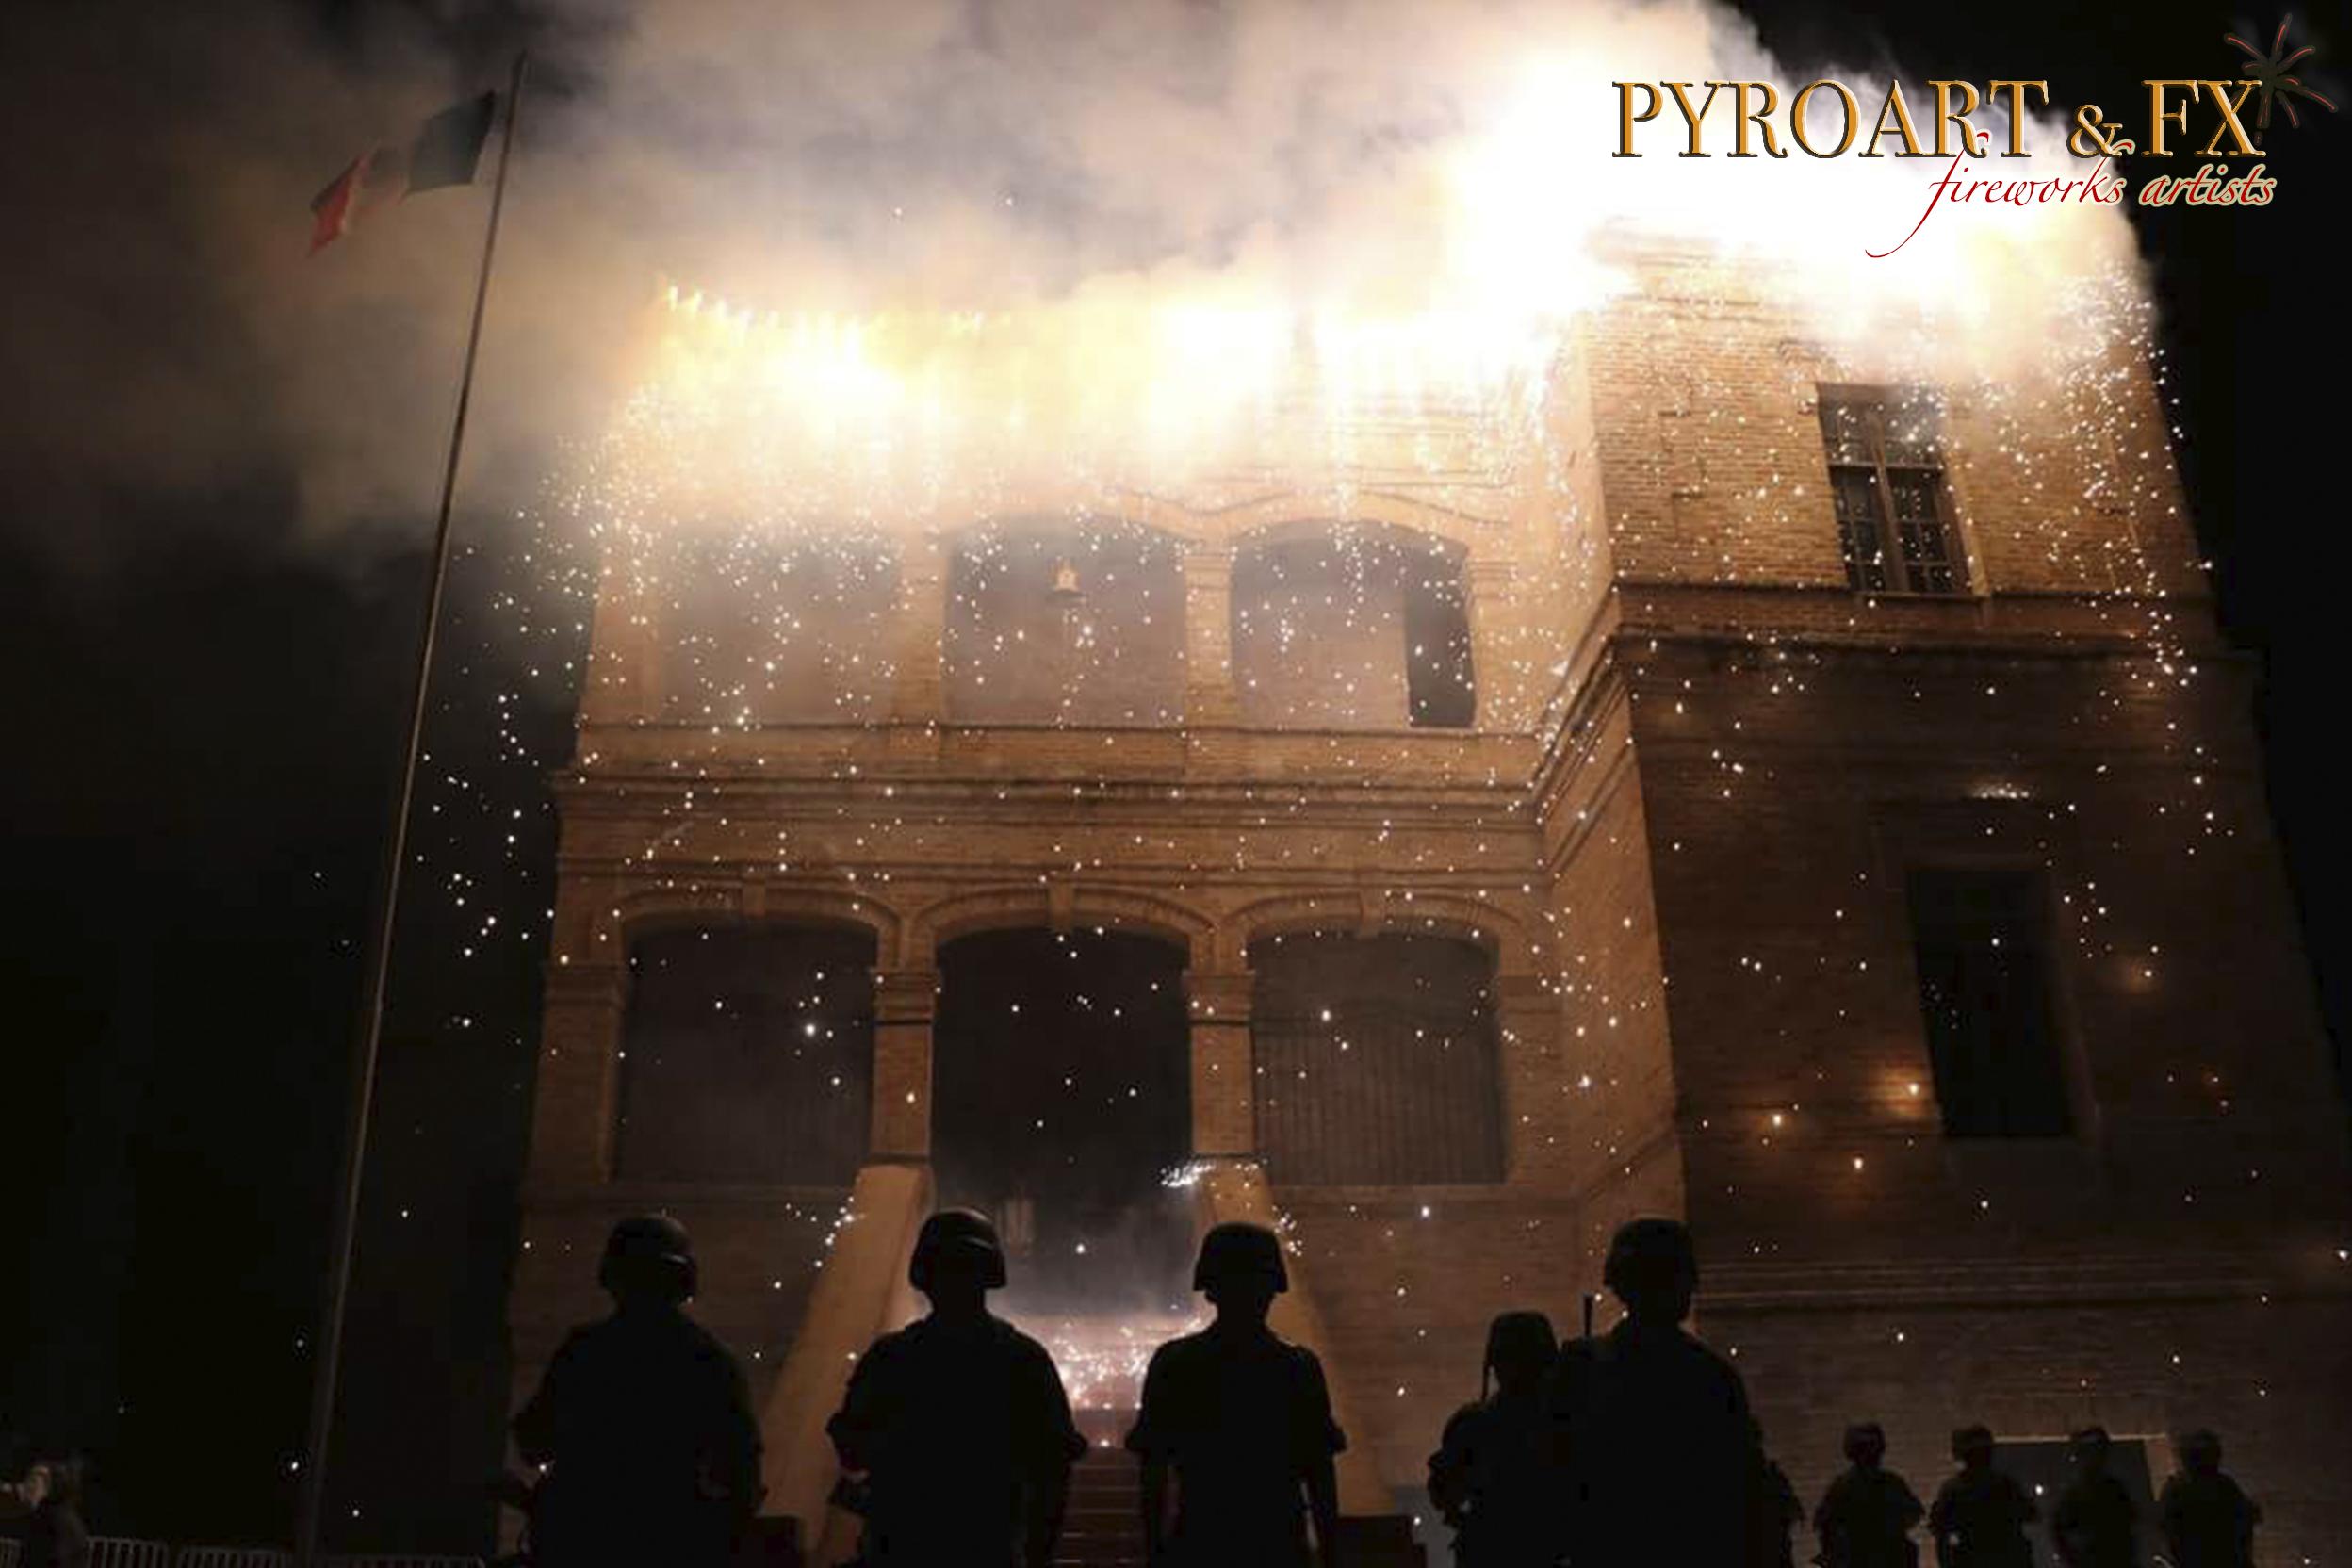 PYROART & FX - CASCADA RIO BRAVO